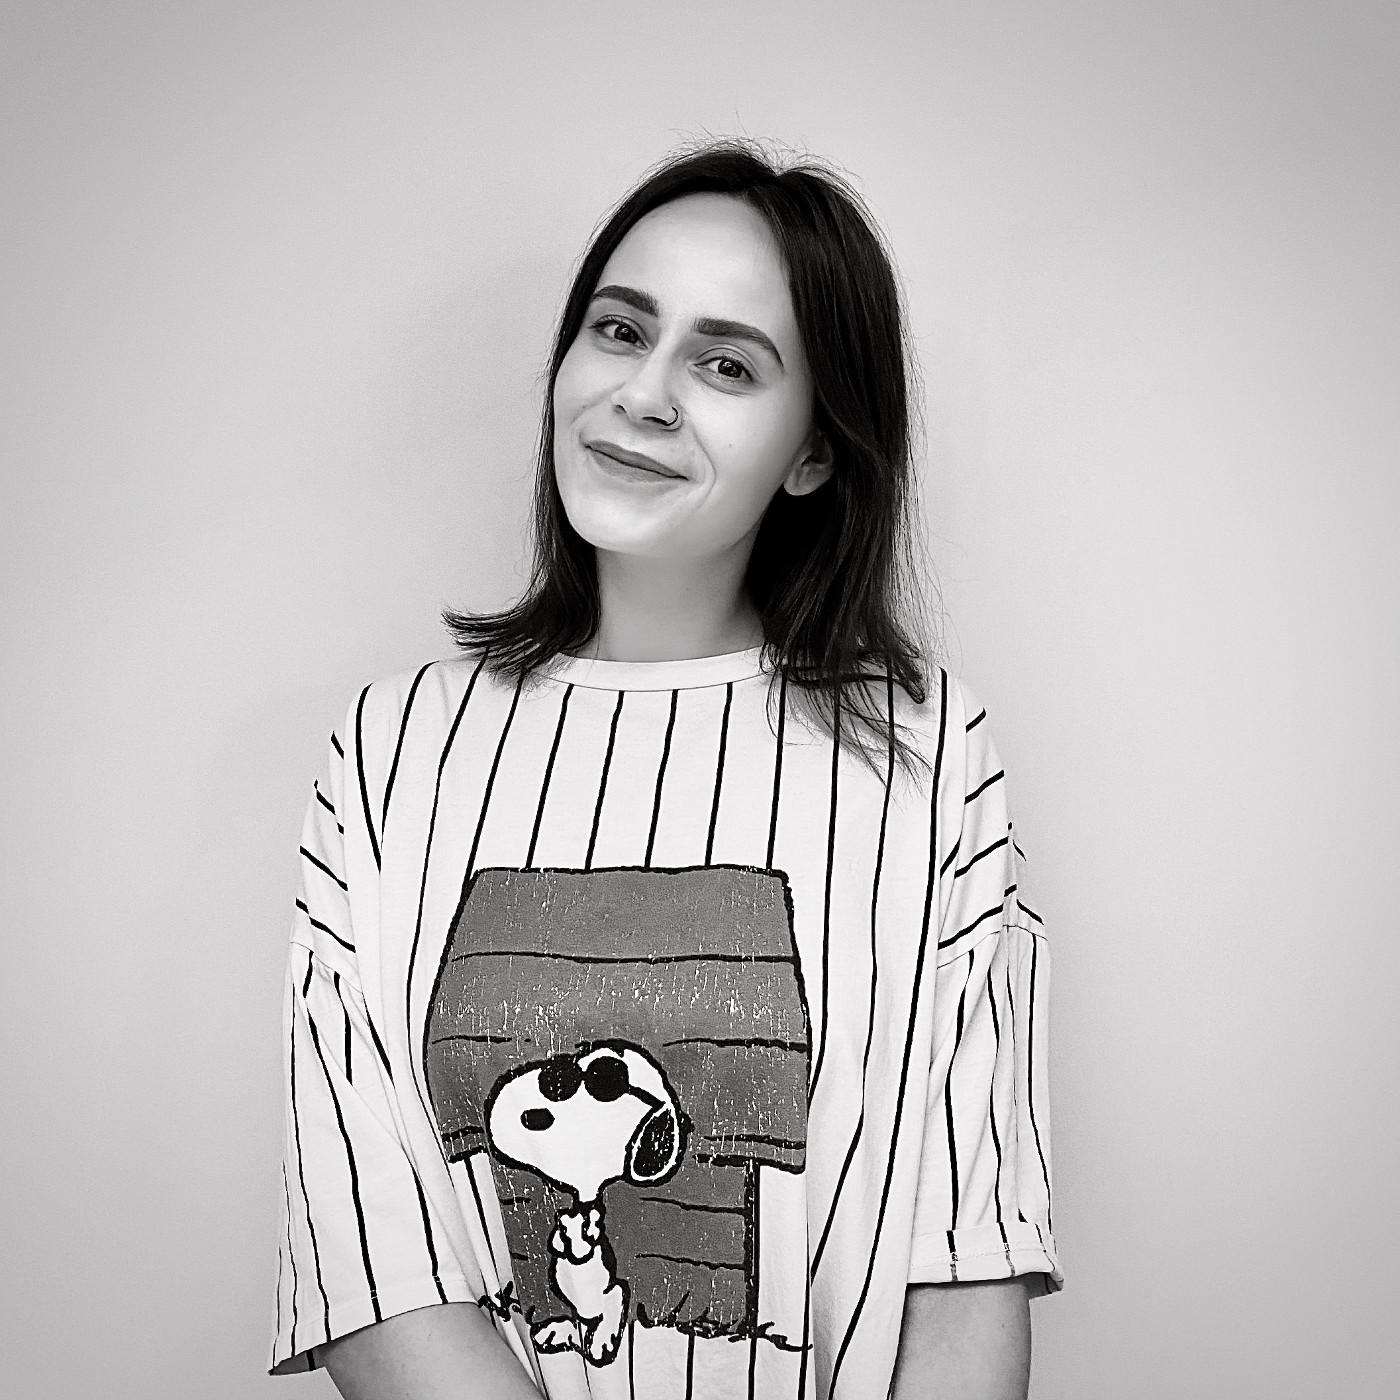 Оля. Джуніор дизайнер